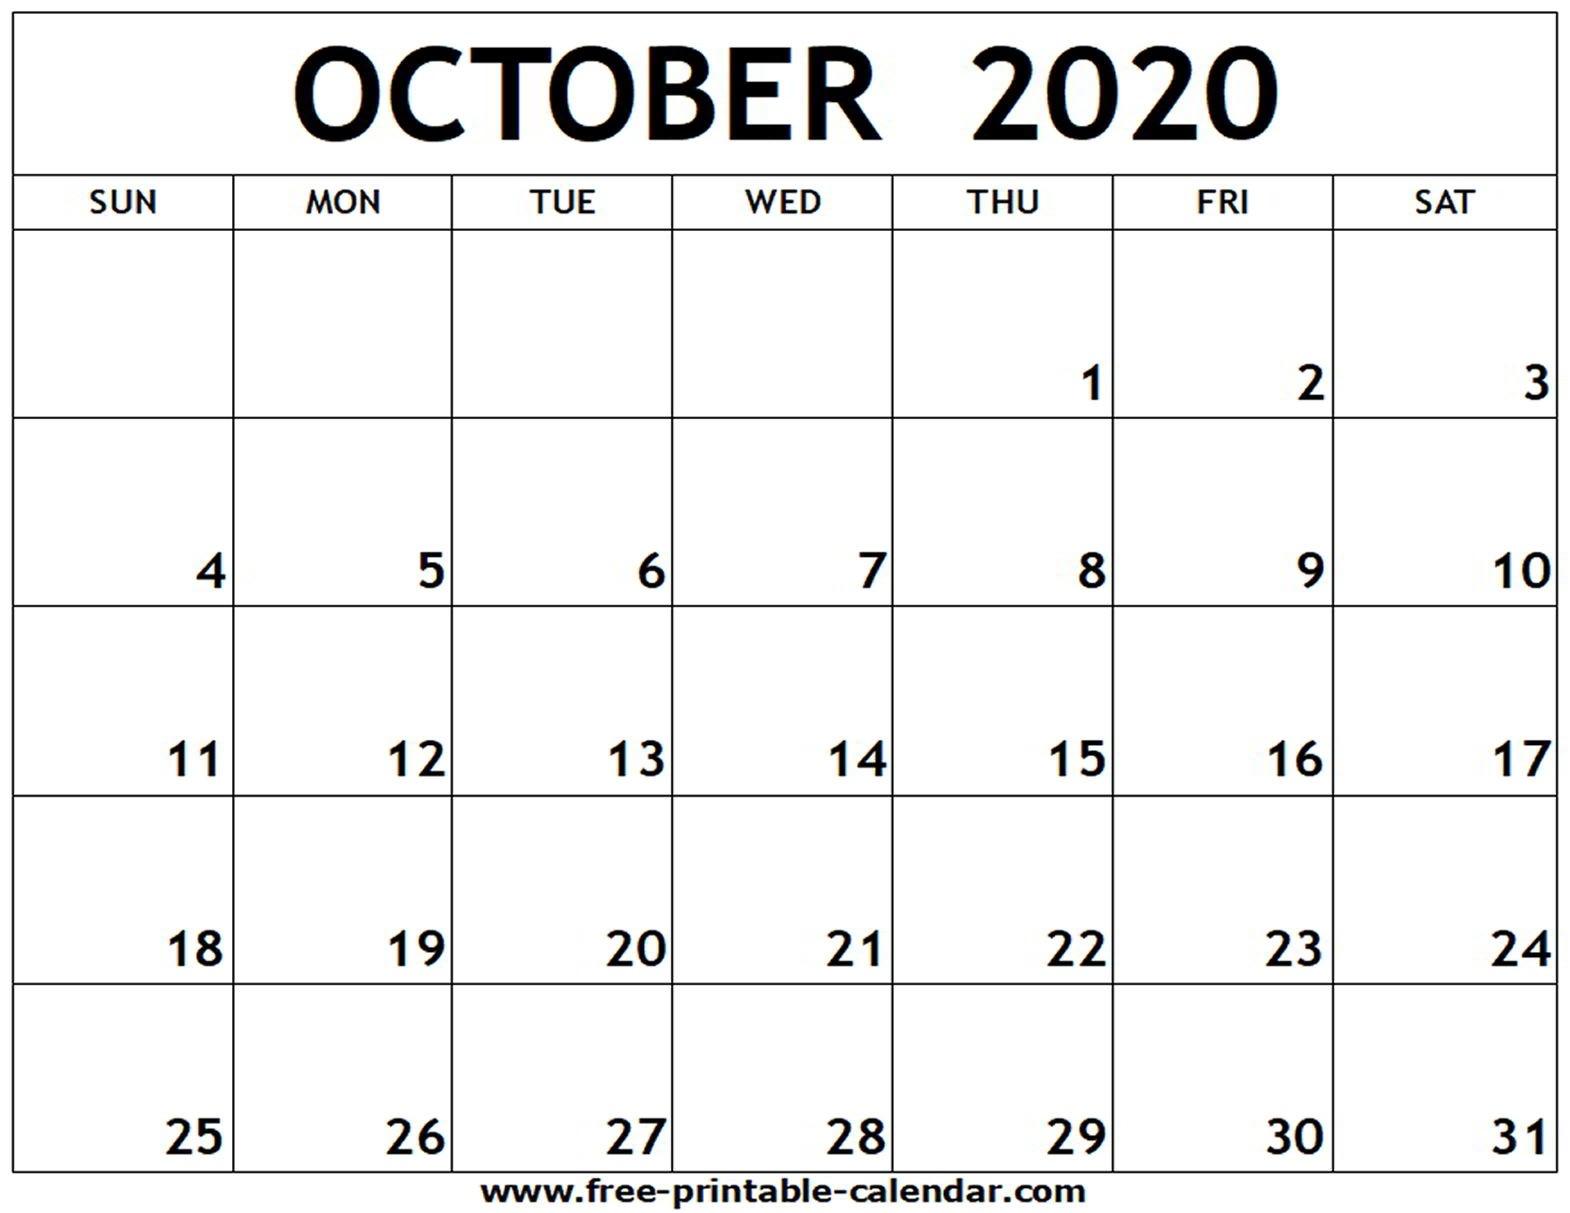 October 2020 Printable Calendar - Free-Printable-Calendar-Blank Calendar October 2020 Printable